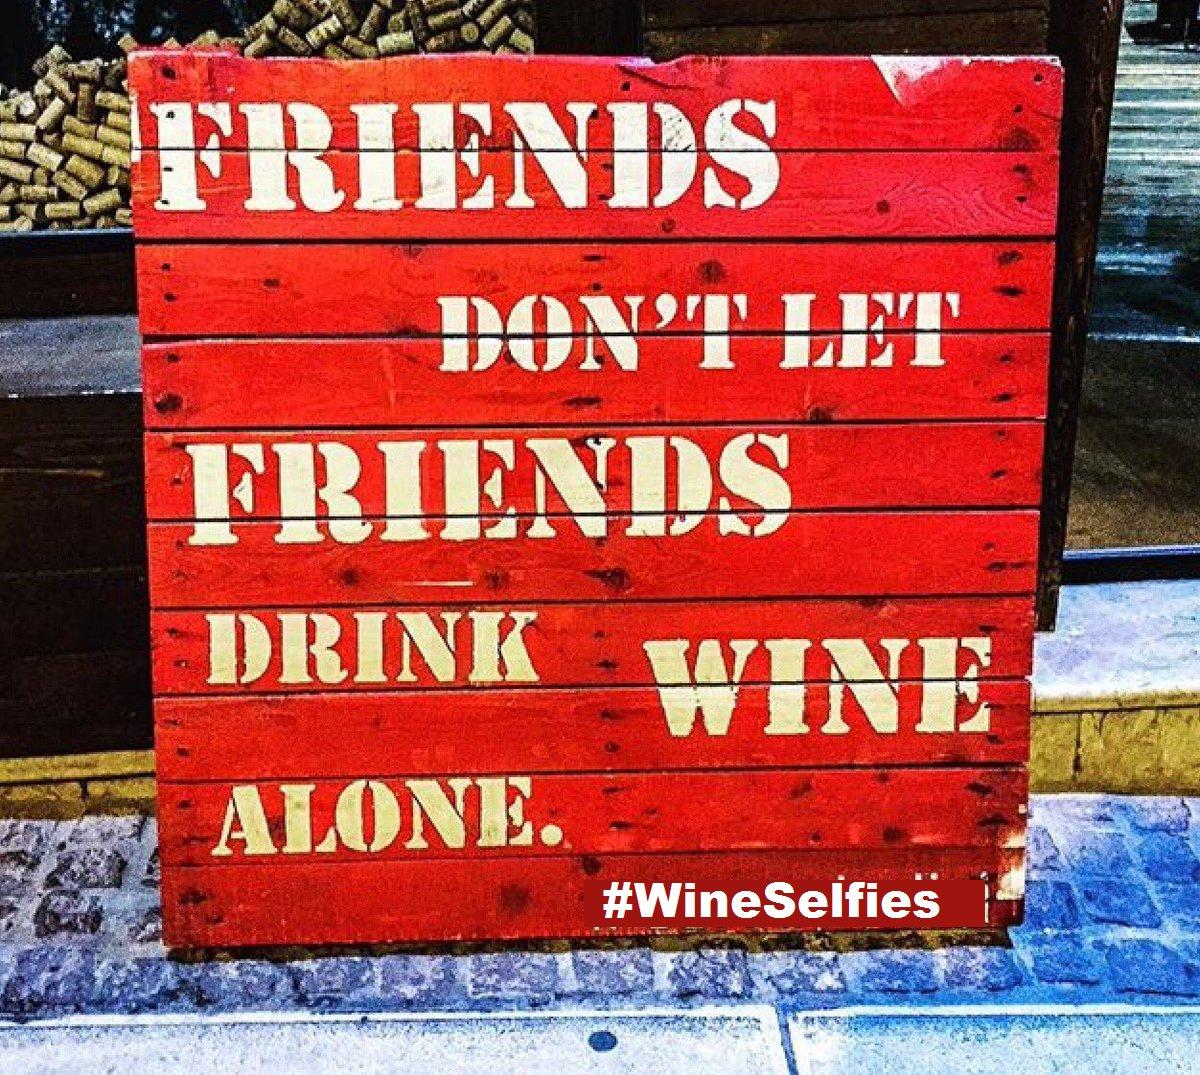 test Twitter Media - Friends don't let friends drink #wine alone! #wineoclock #wineselfies #winelovers https://t.co/MUSNVr7Dr6